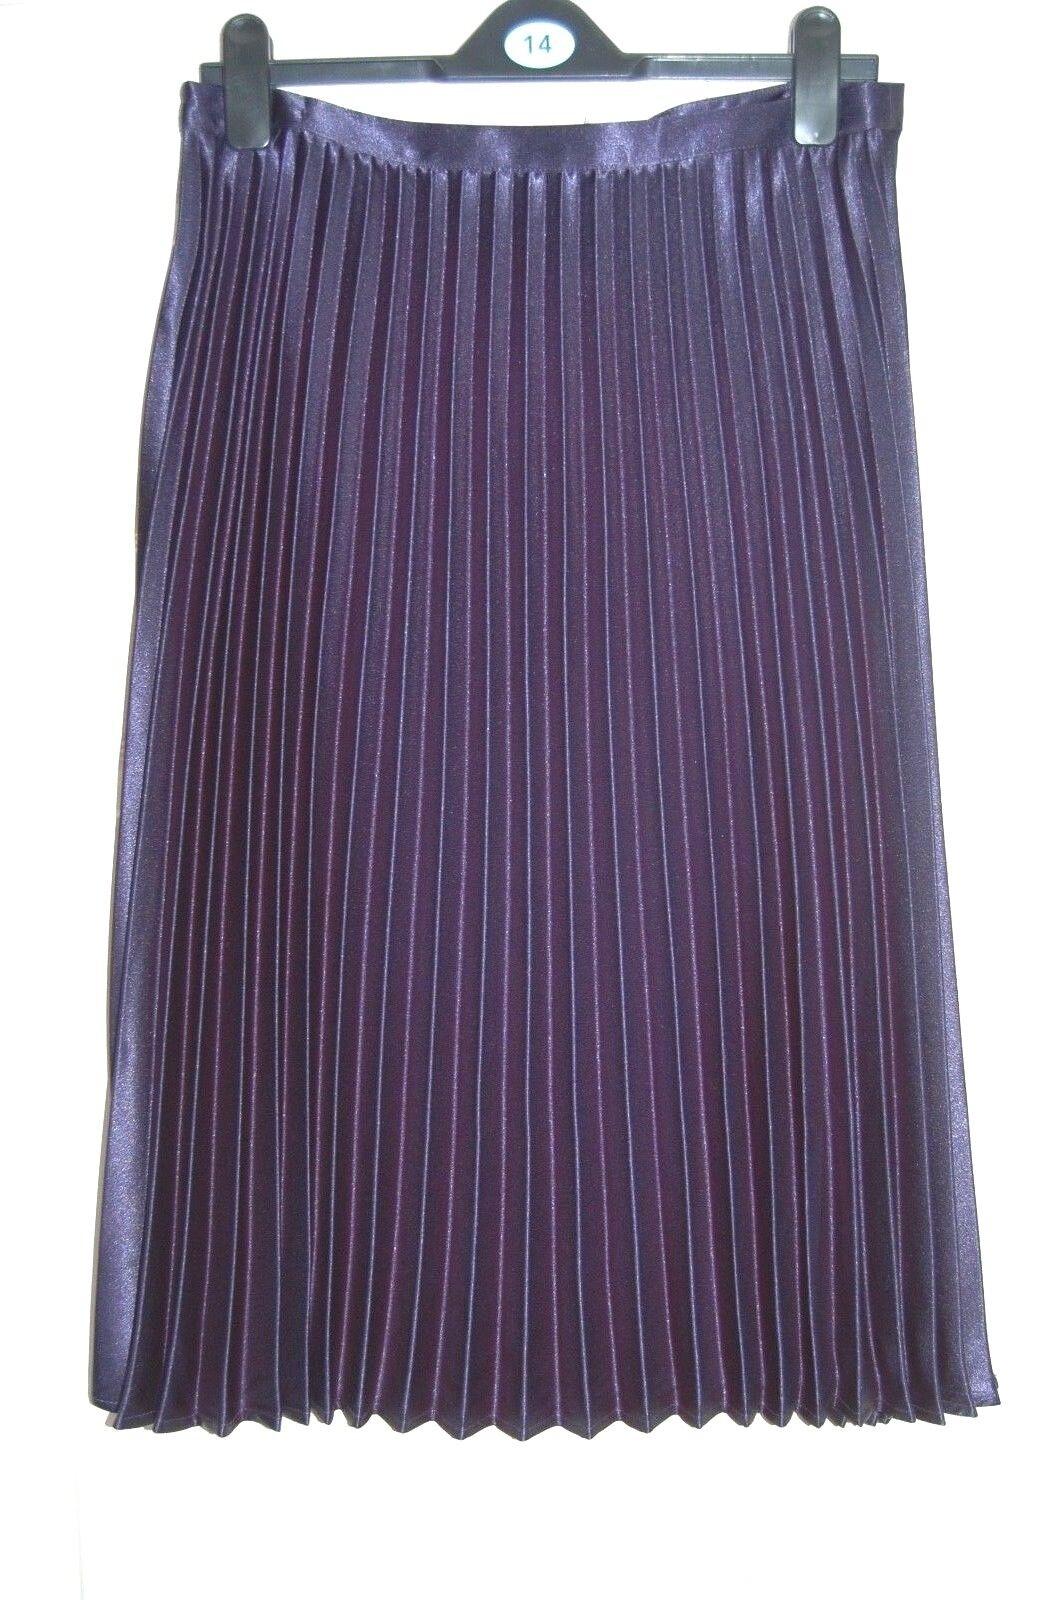 ️ ️ NEW 12 14 16 18 Metallic Navy bluee Pleated Midi Satin Sheen Skirt Zip